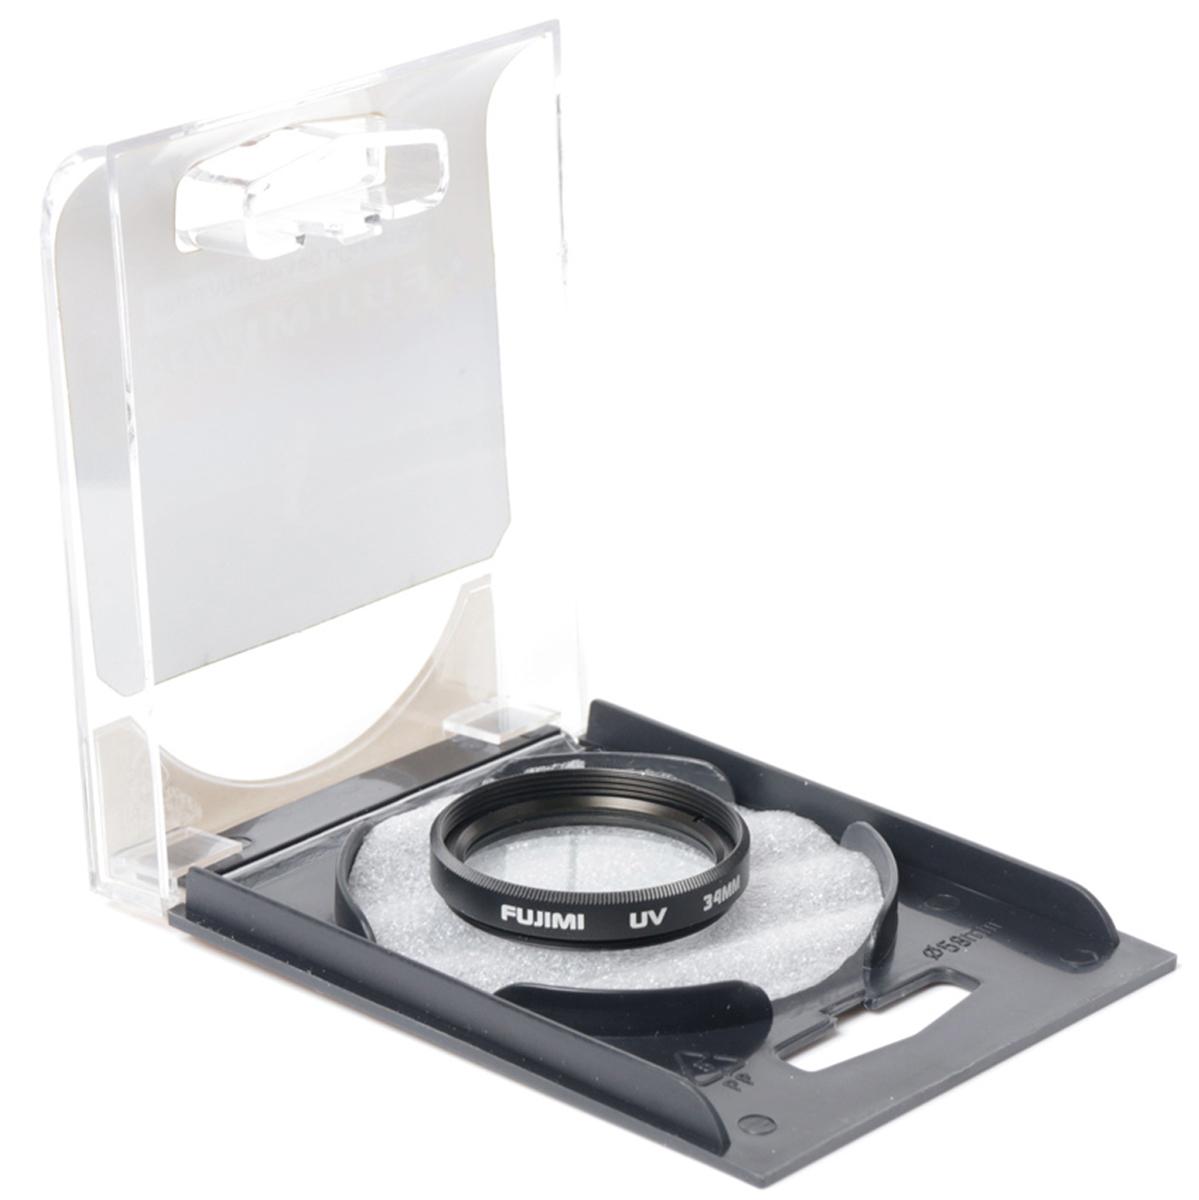 Fujimi UV М34мм, Black ультрафиолетовый фильтр (34 мм)